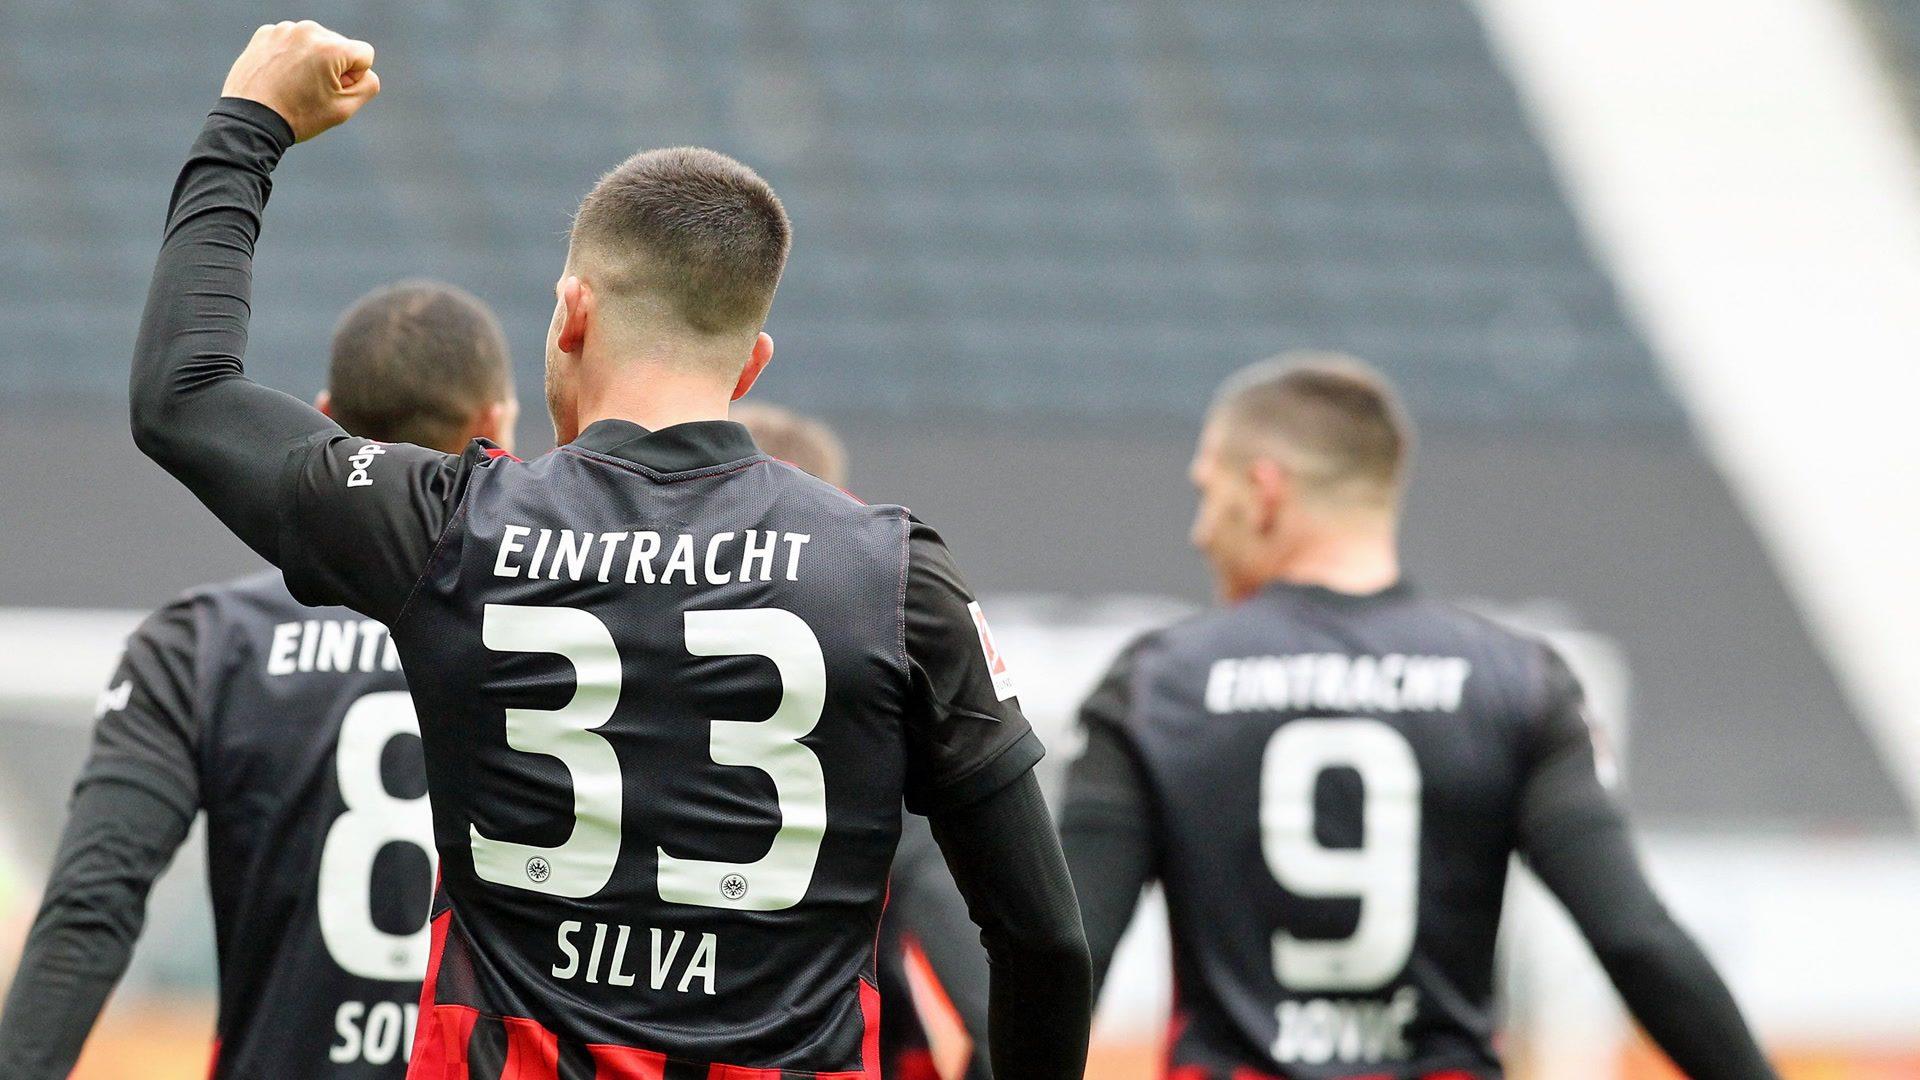 Silva shines in seven-goal thriller with Wolfsburg